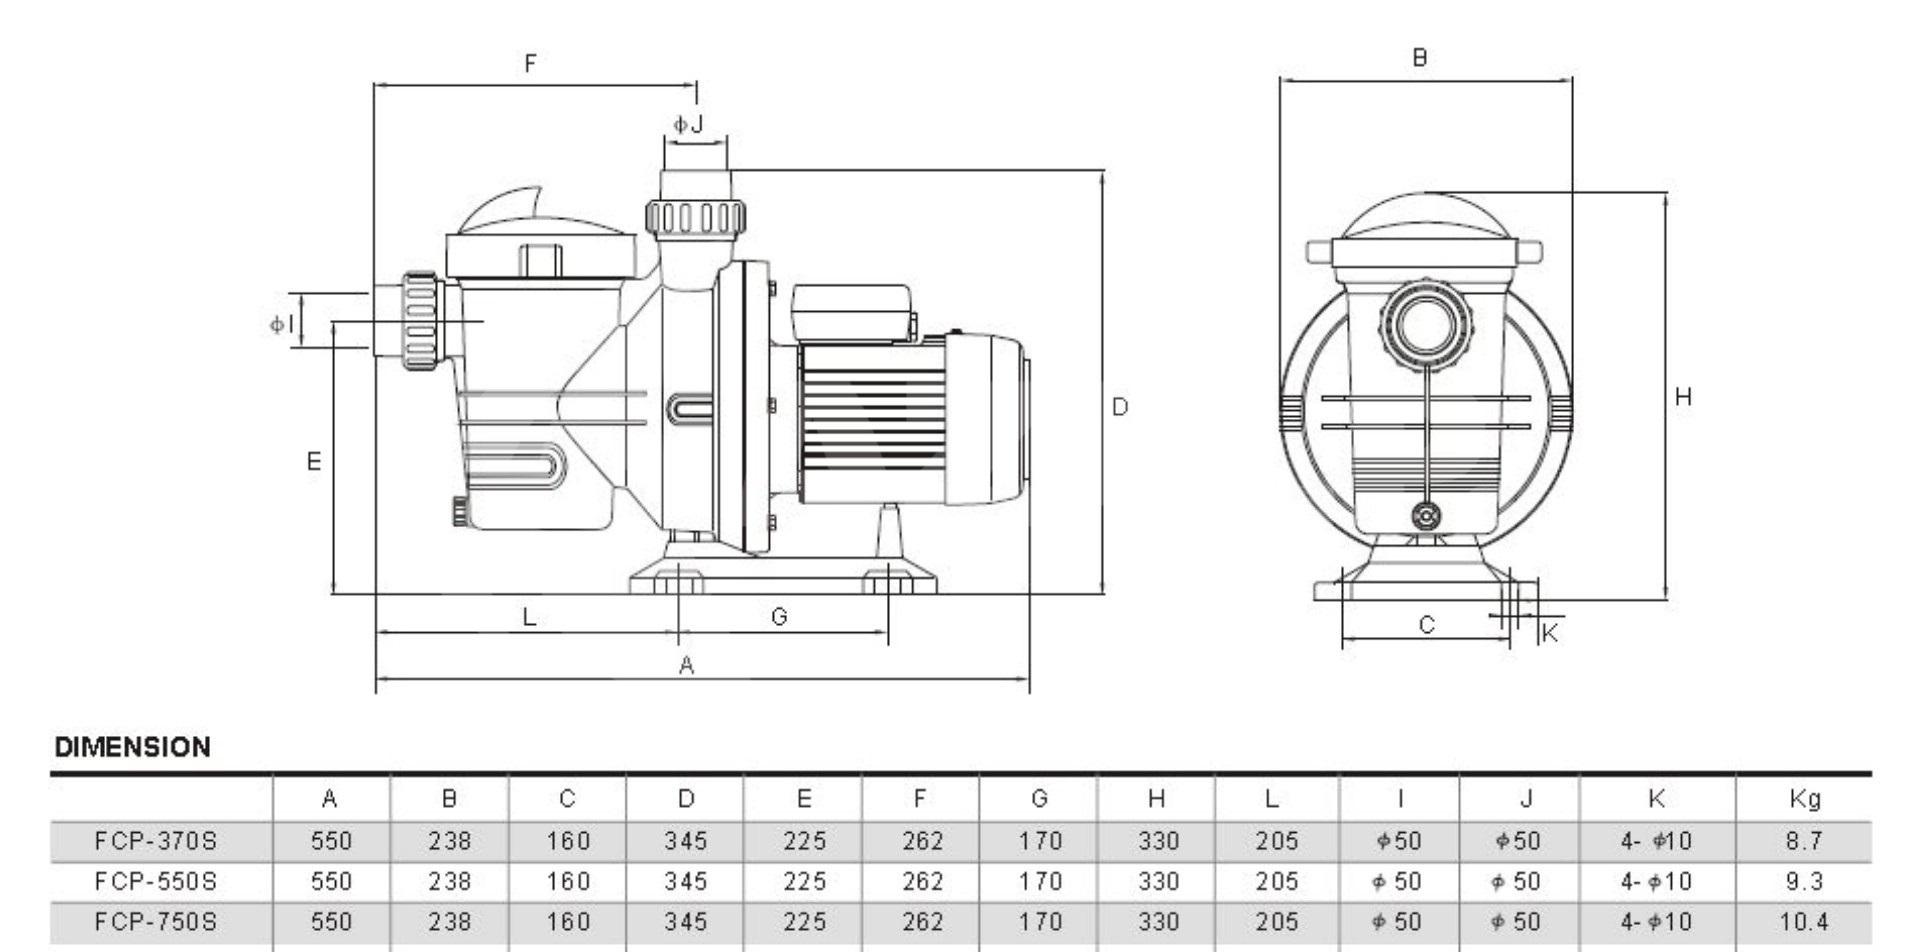 Pesi e diensioni Glong FCP 750S